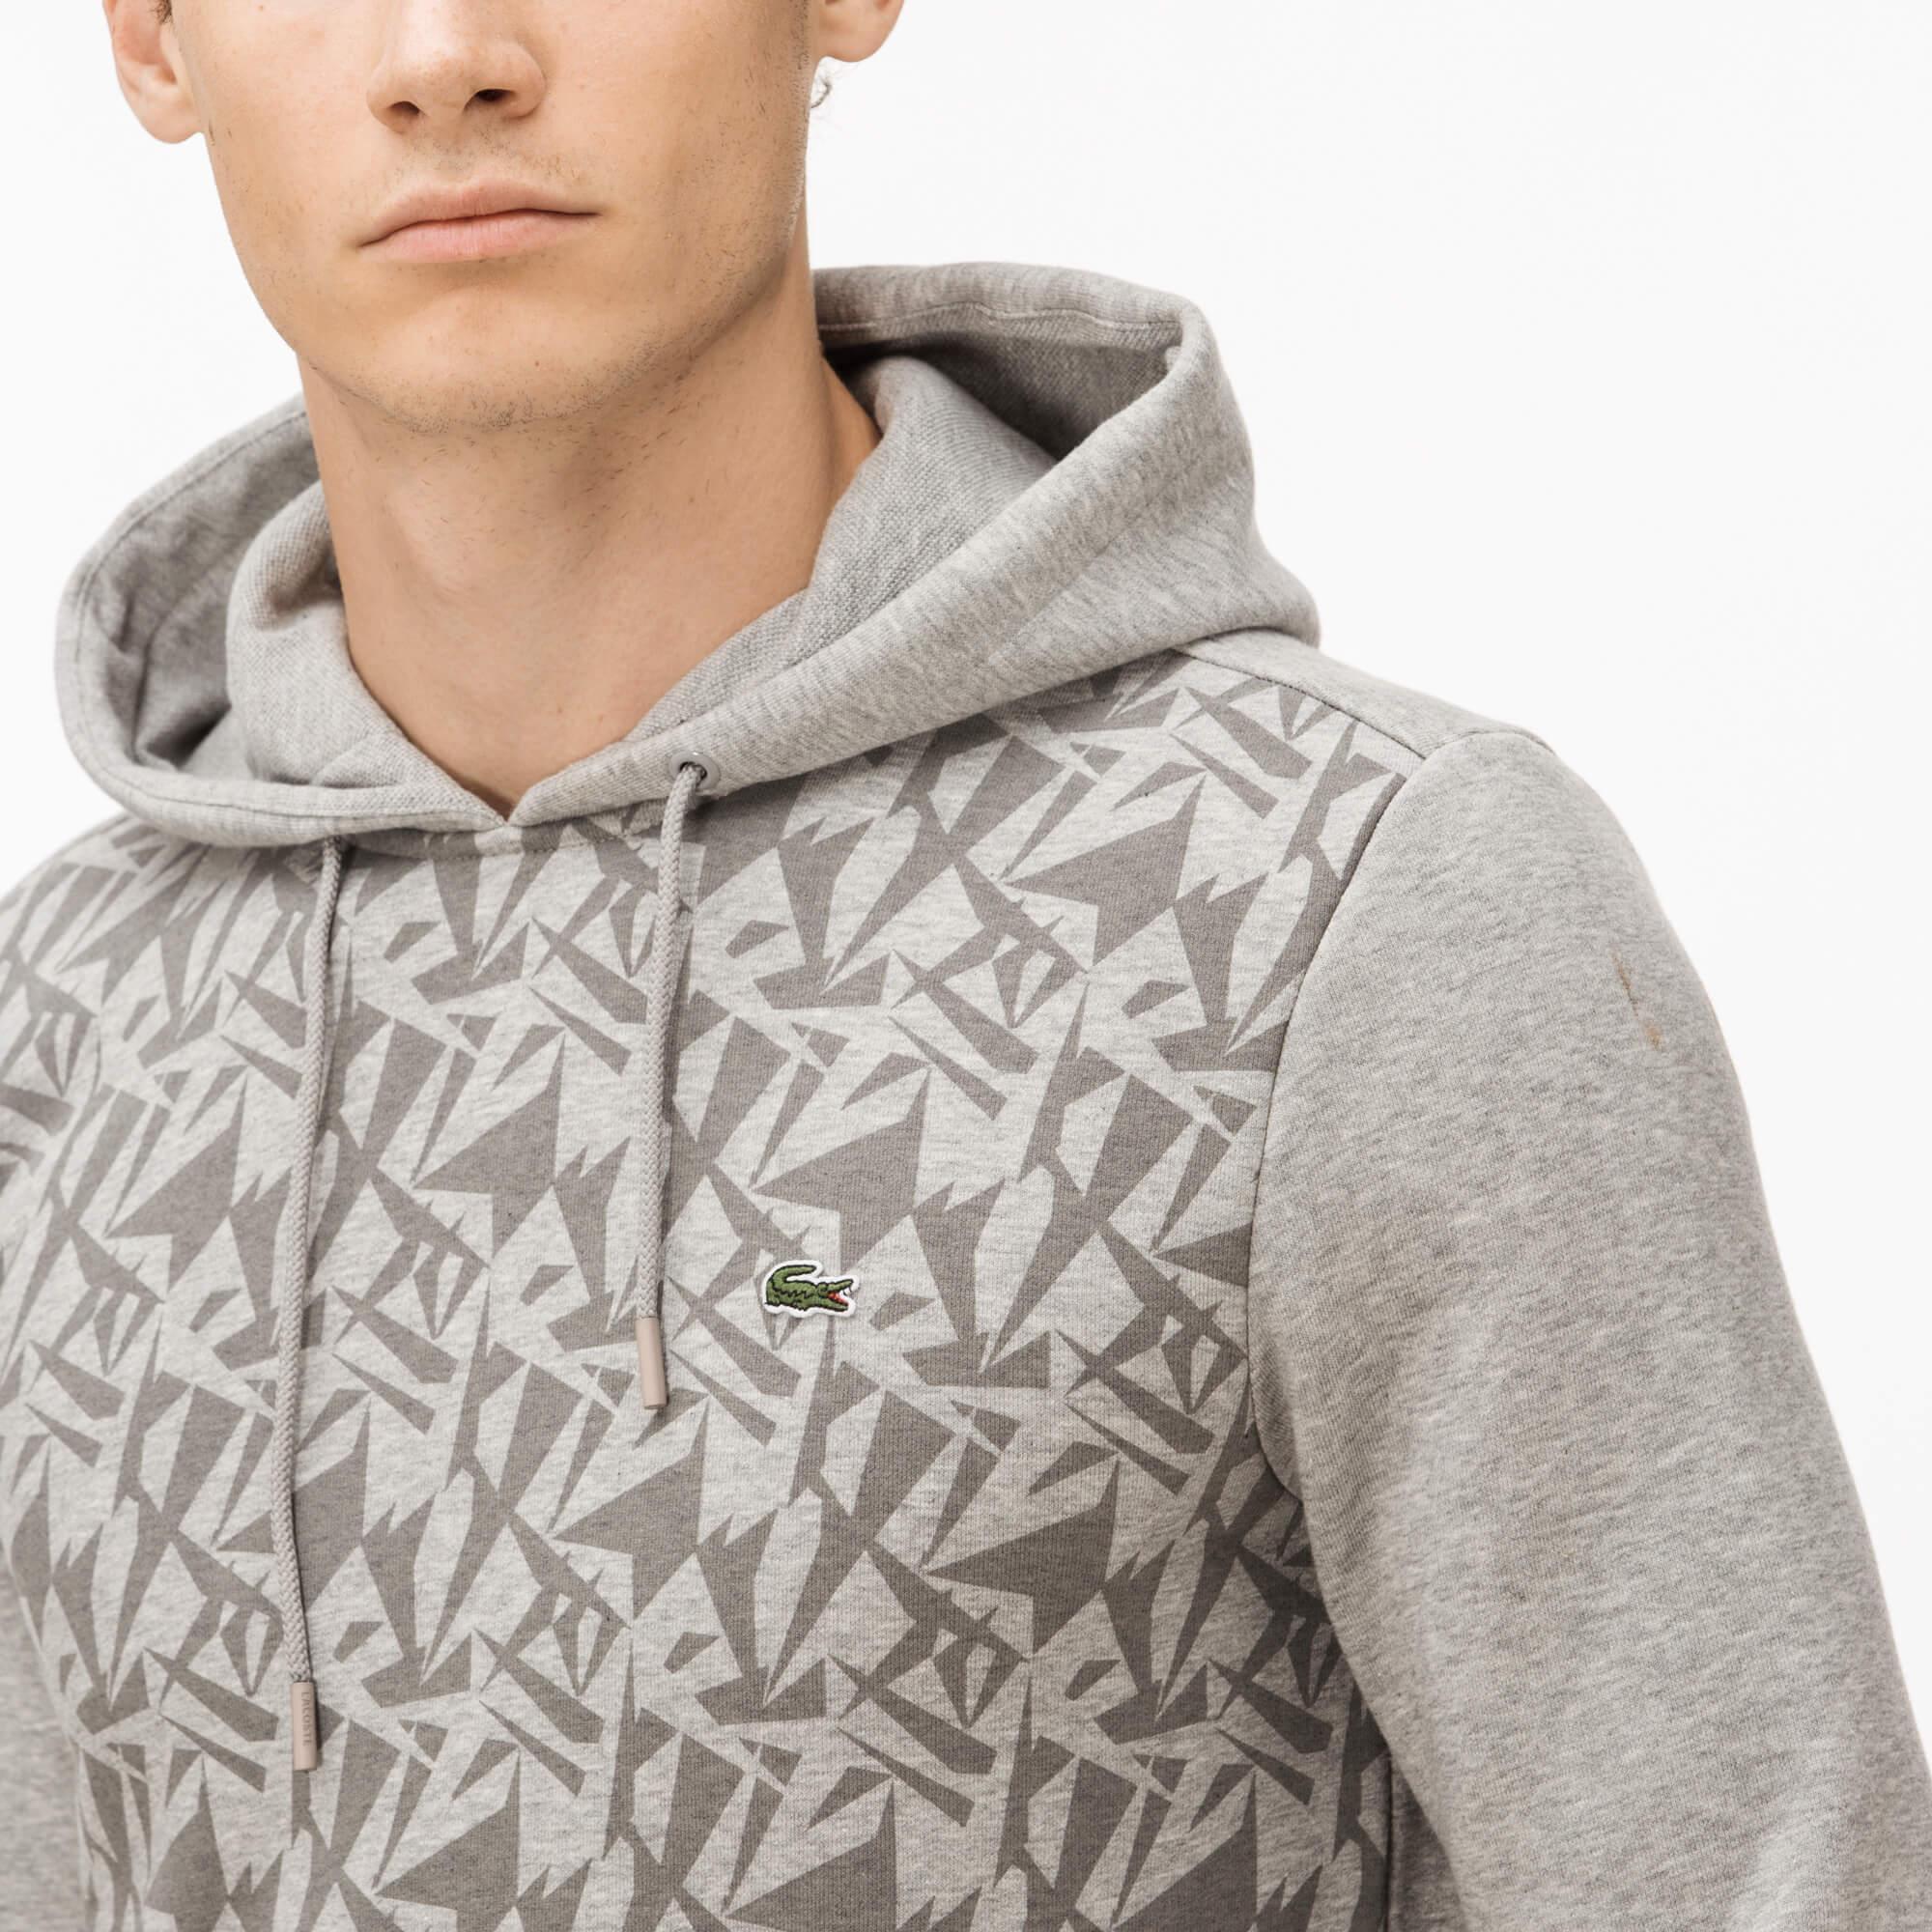 Lacoste Erkek Gri Kapüşonlu Sweatshirt